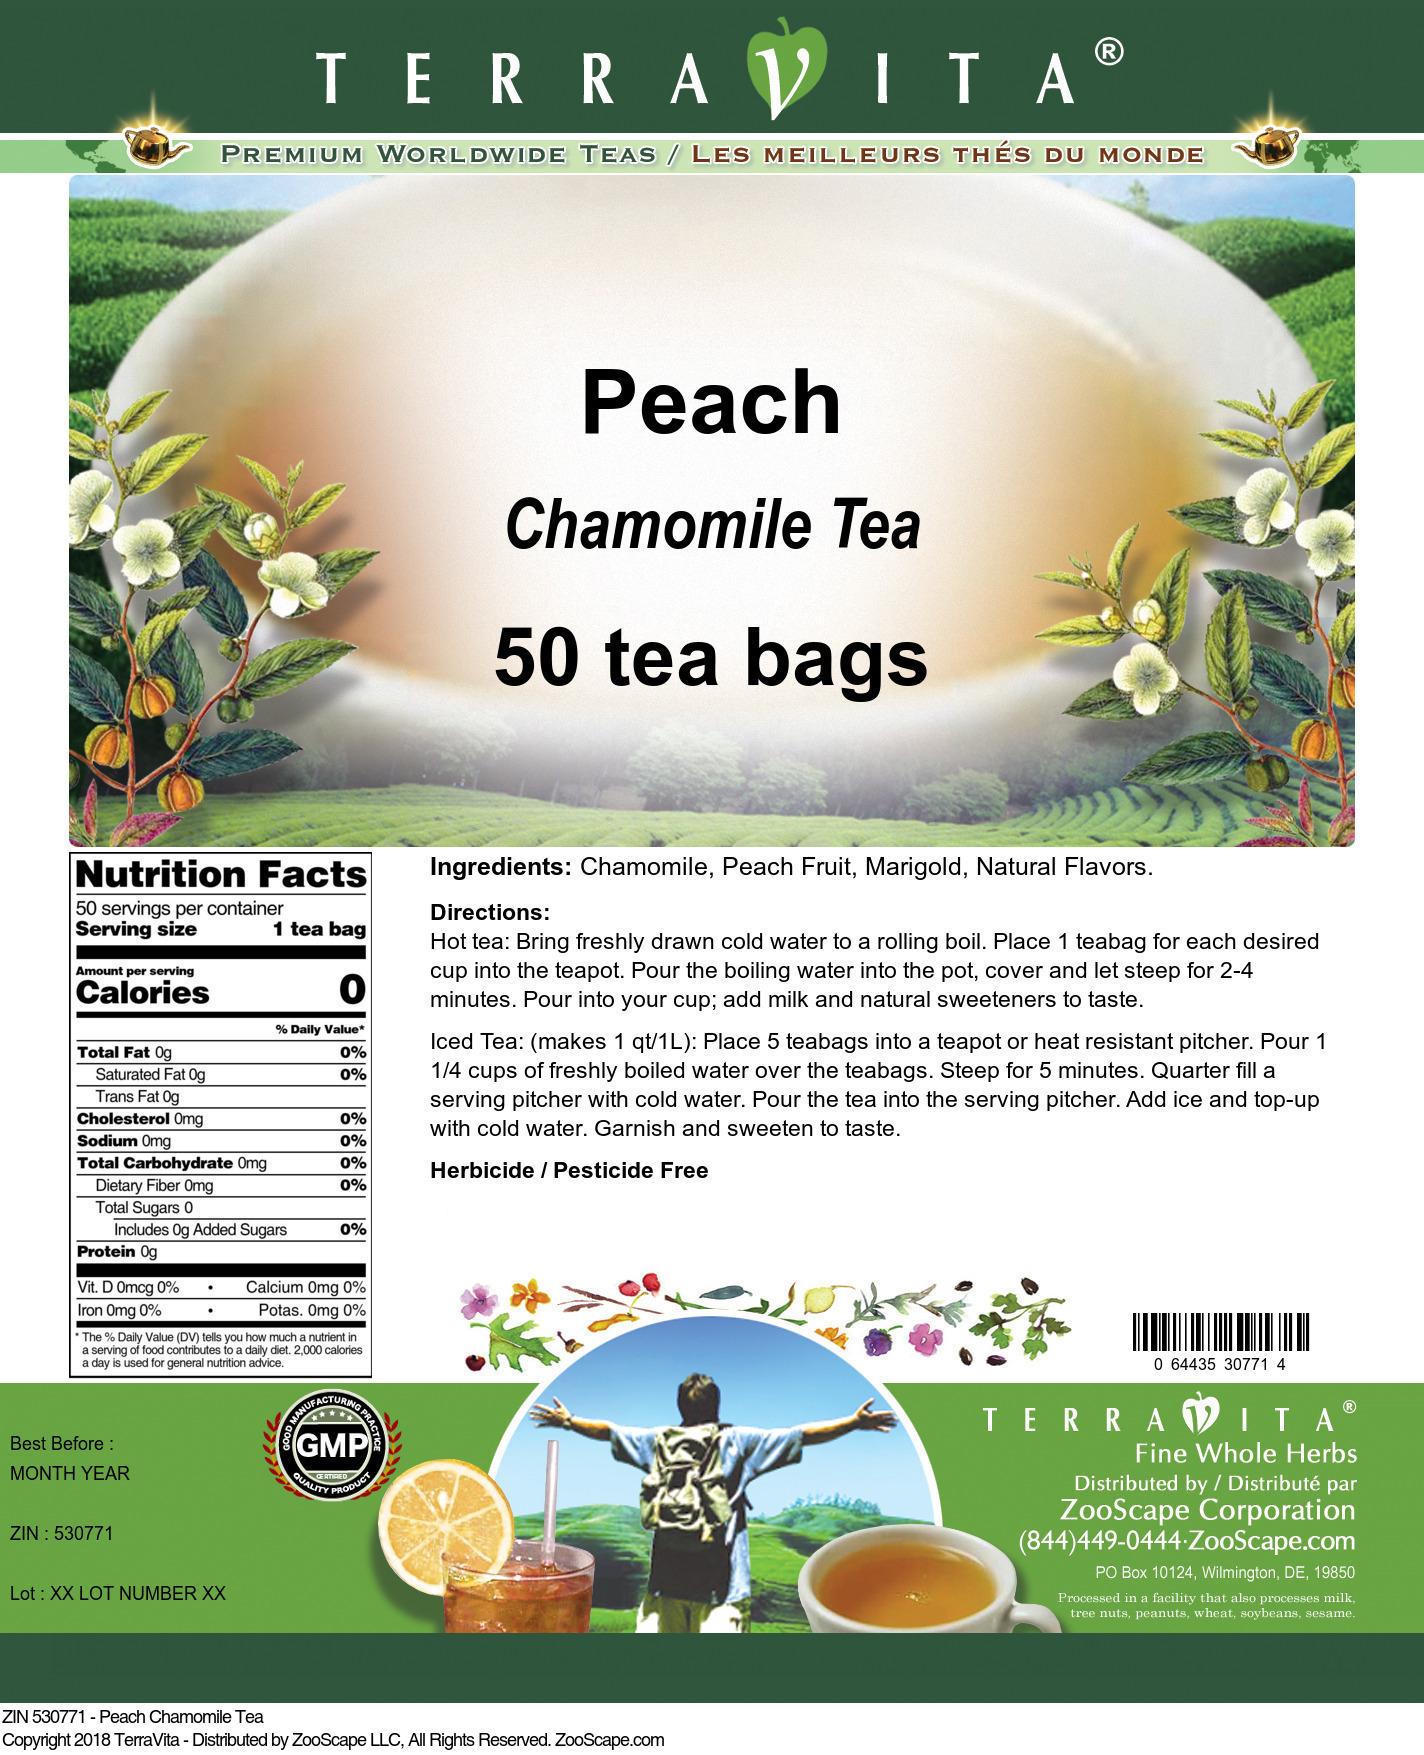 Peach Chamomile Tea